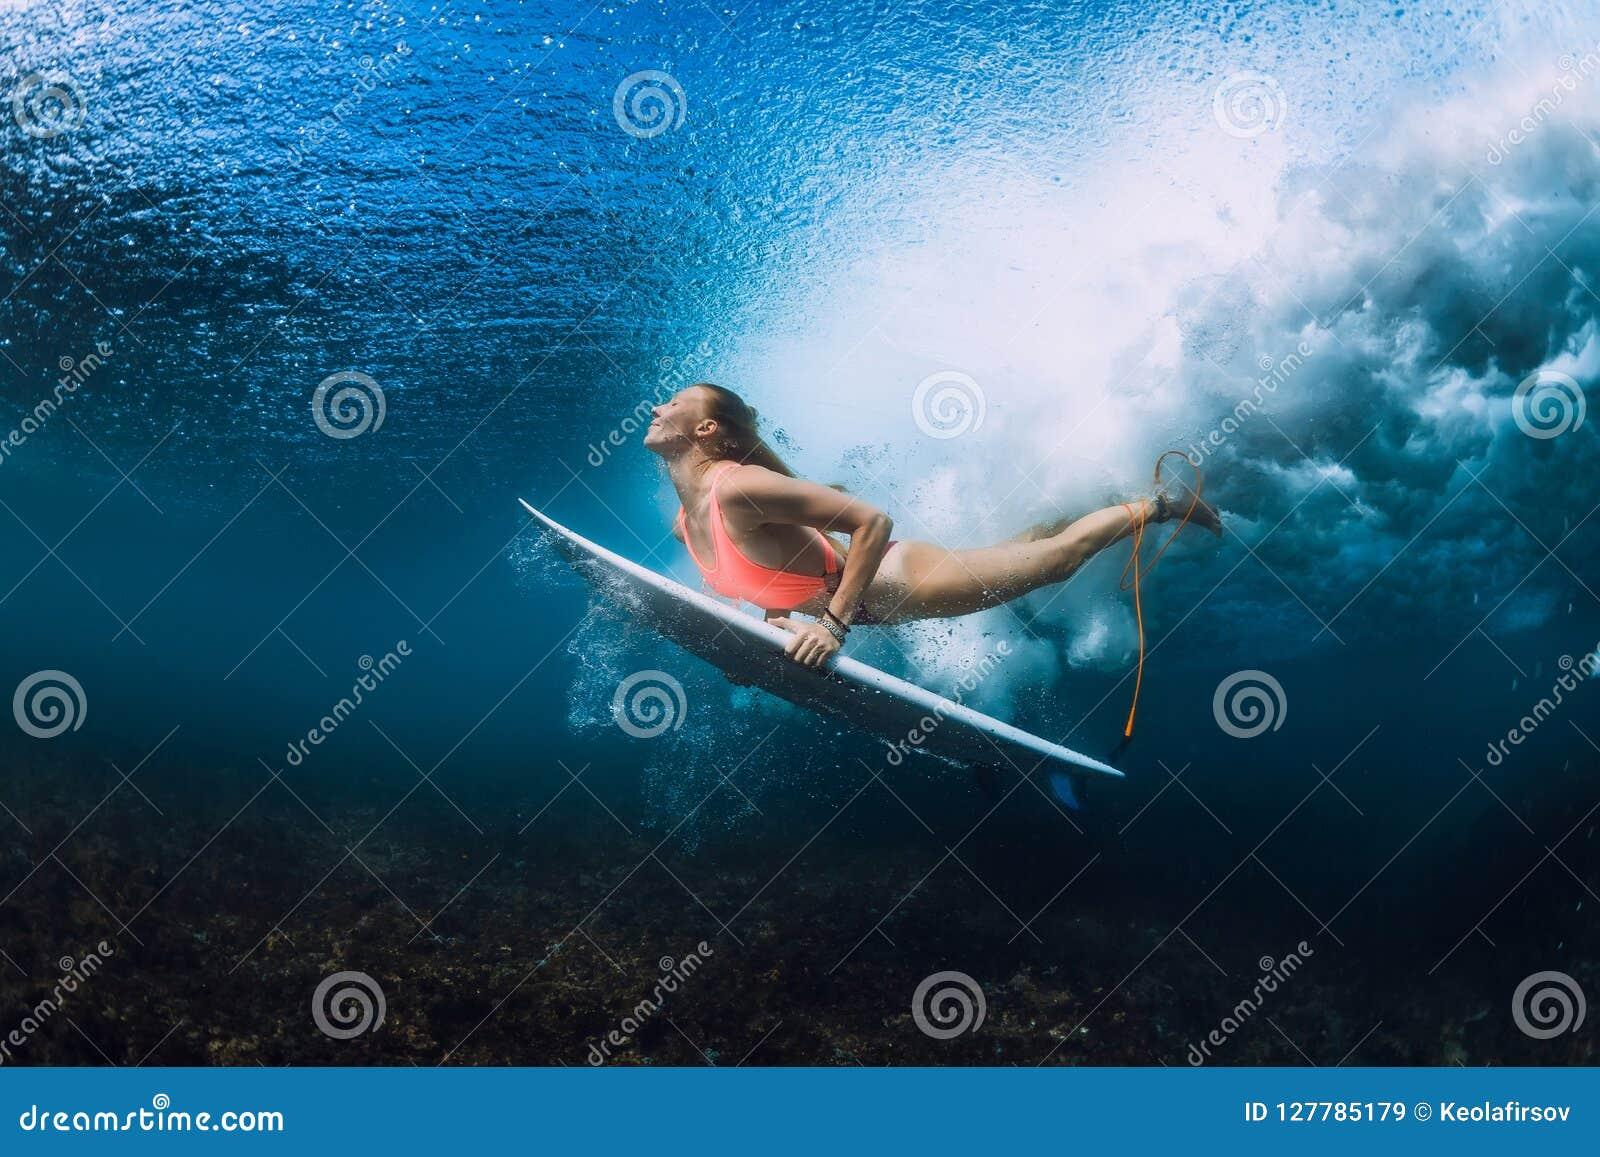 Attractive surfer woman dive underwater with under wave.